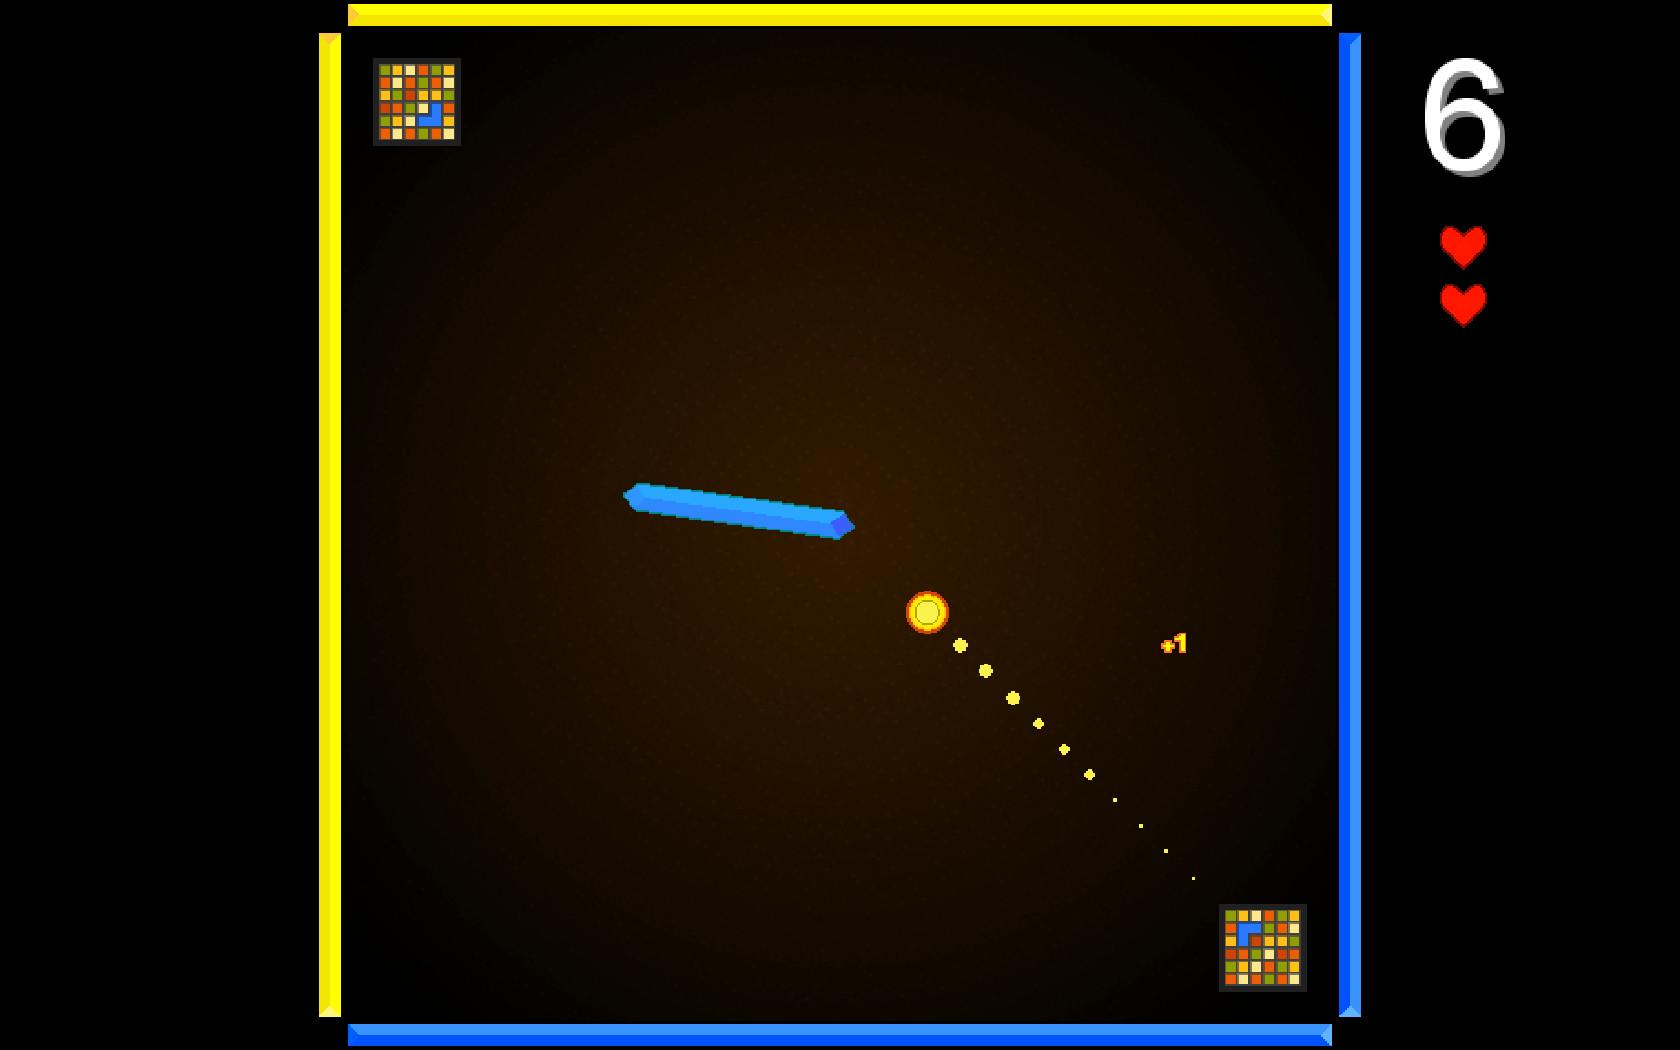 Games for colorblind - Games For Colorblind 59